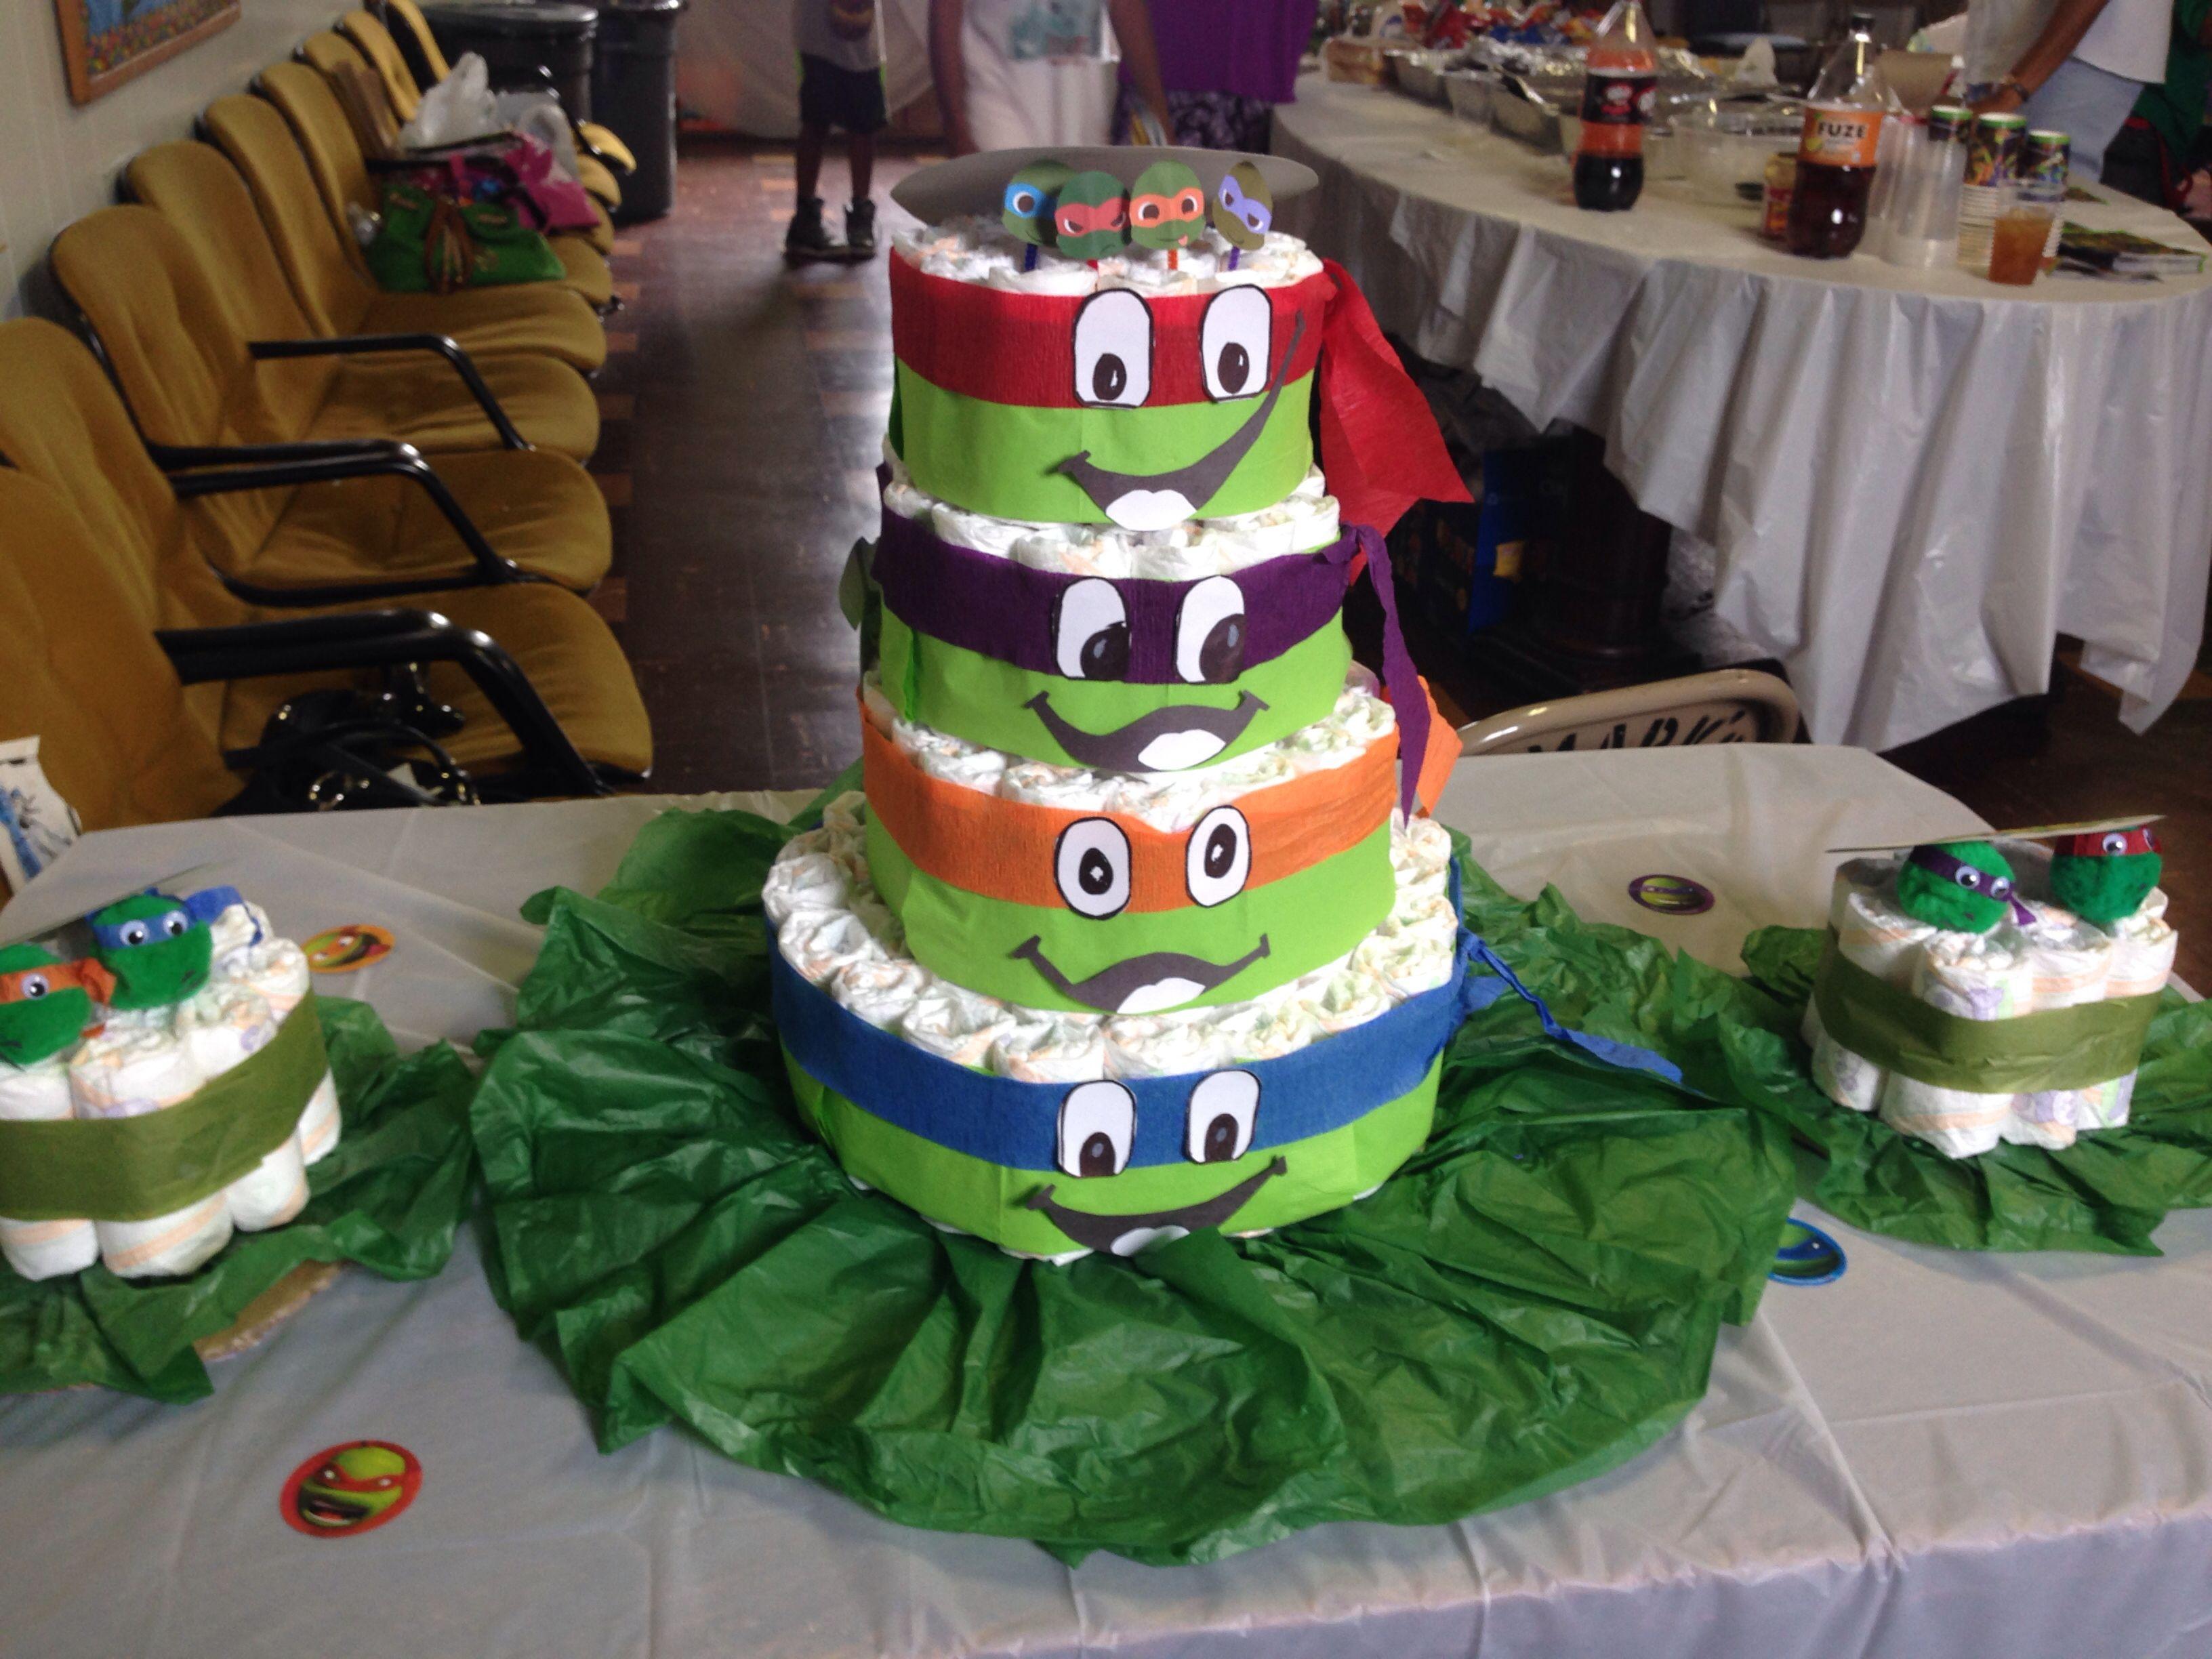 Attractive Ninja Turtle Themed Diaper Cake · Ninja TurtlesBoy Baby ShowersDiaper Cakes